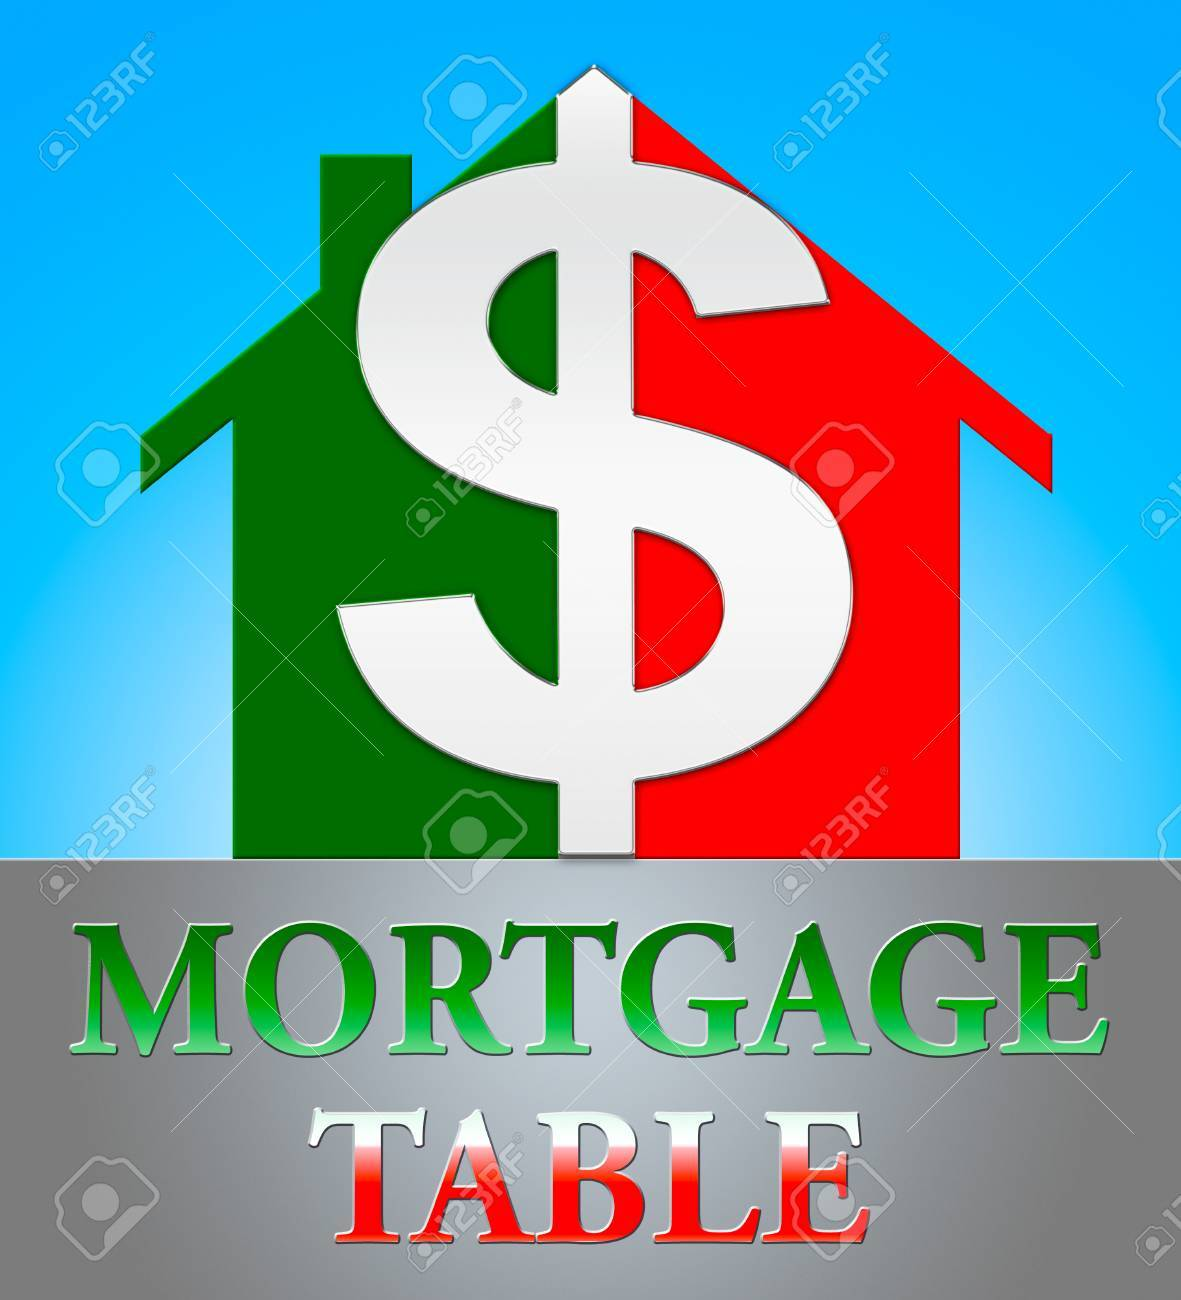 mortgage loan table